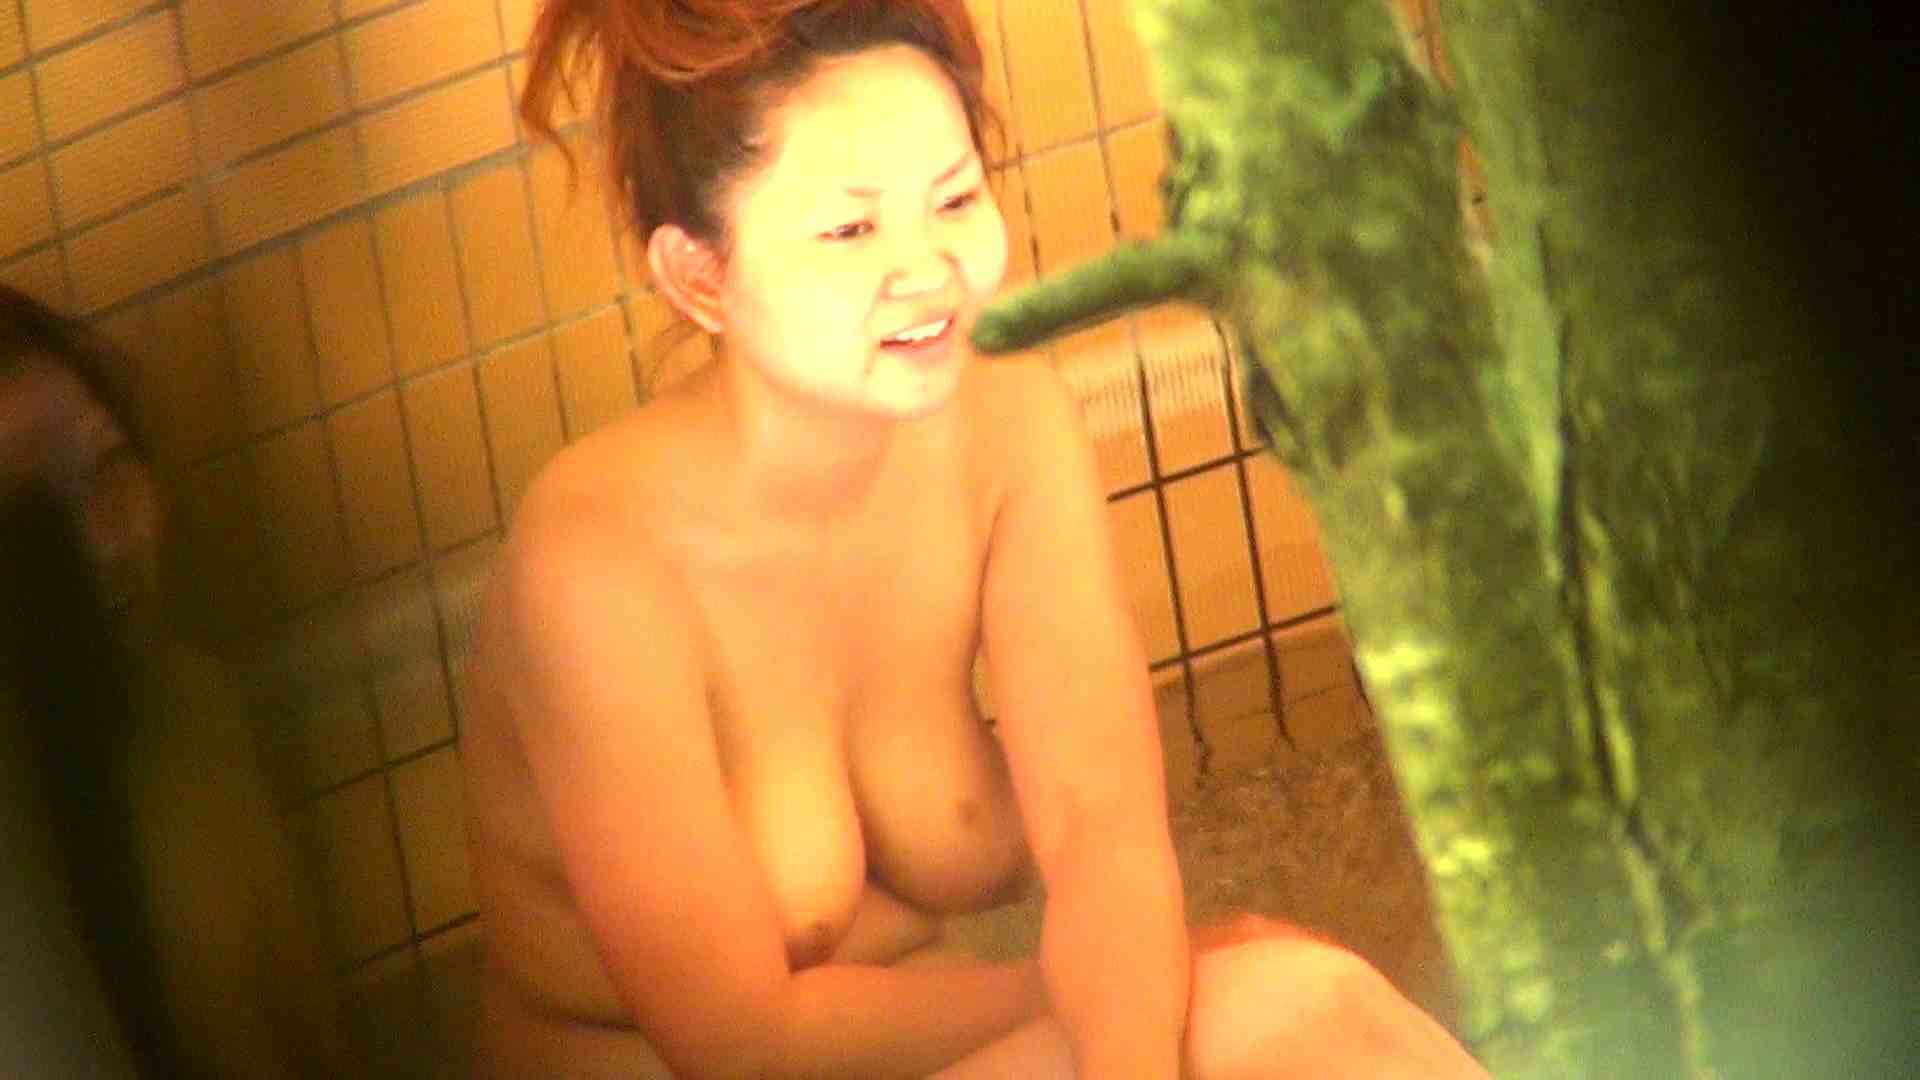 Aquaな露天風呂Vol.267 盗撮シリーズ   露天風呂編  88PIX 79